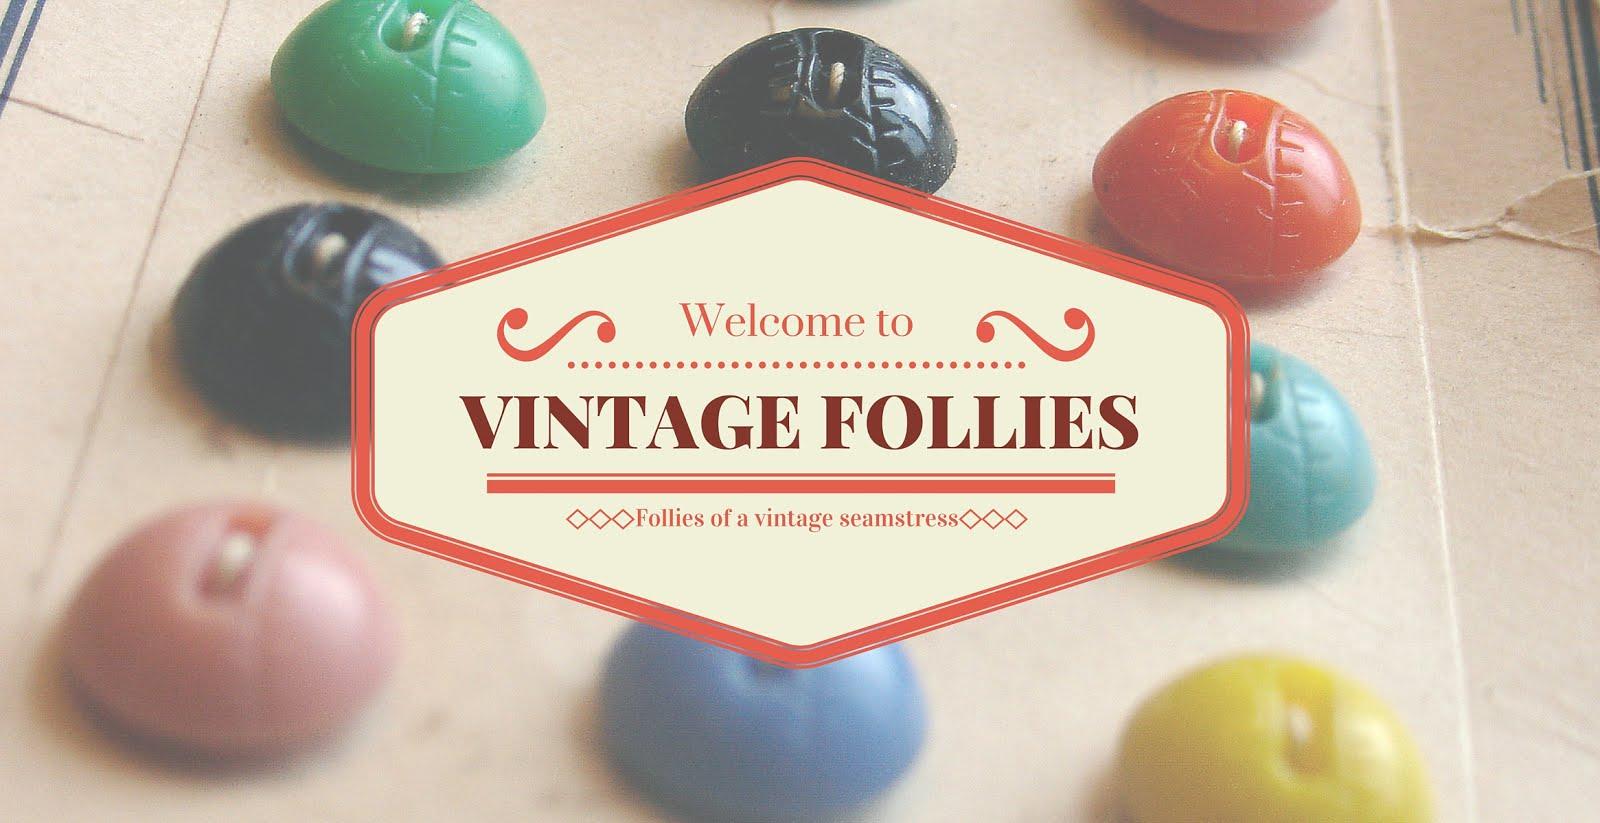 Vintage Follies